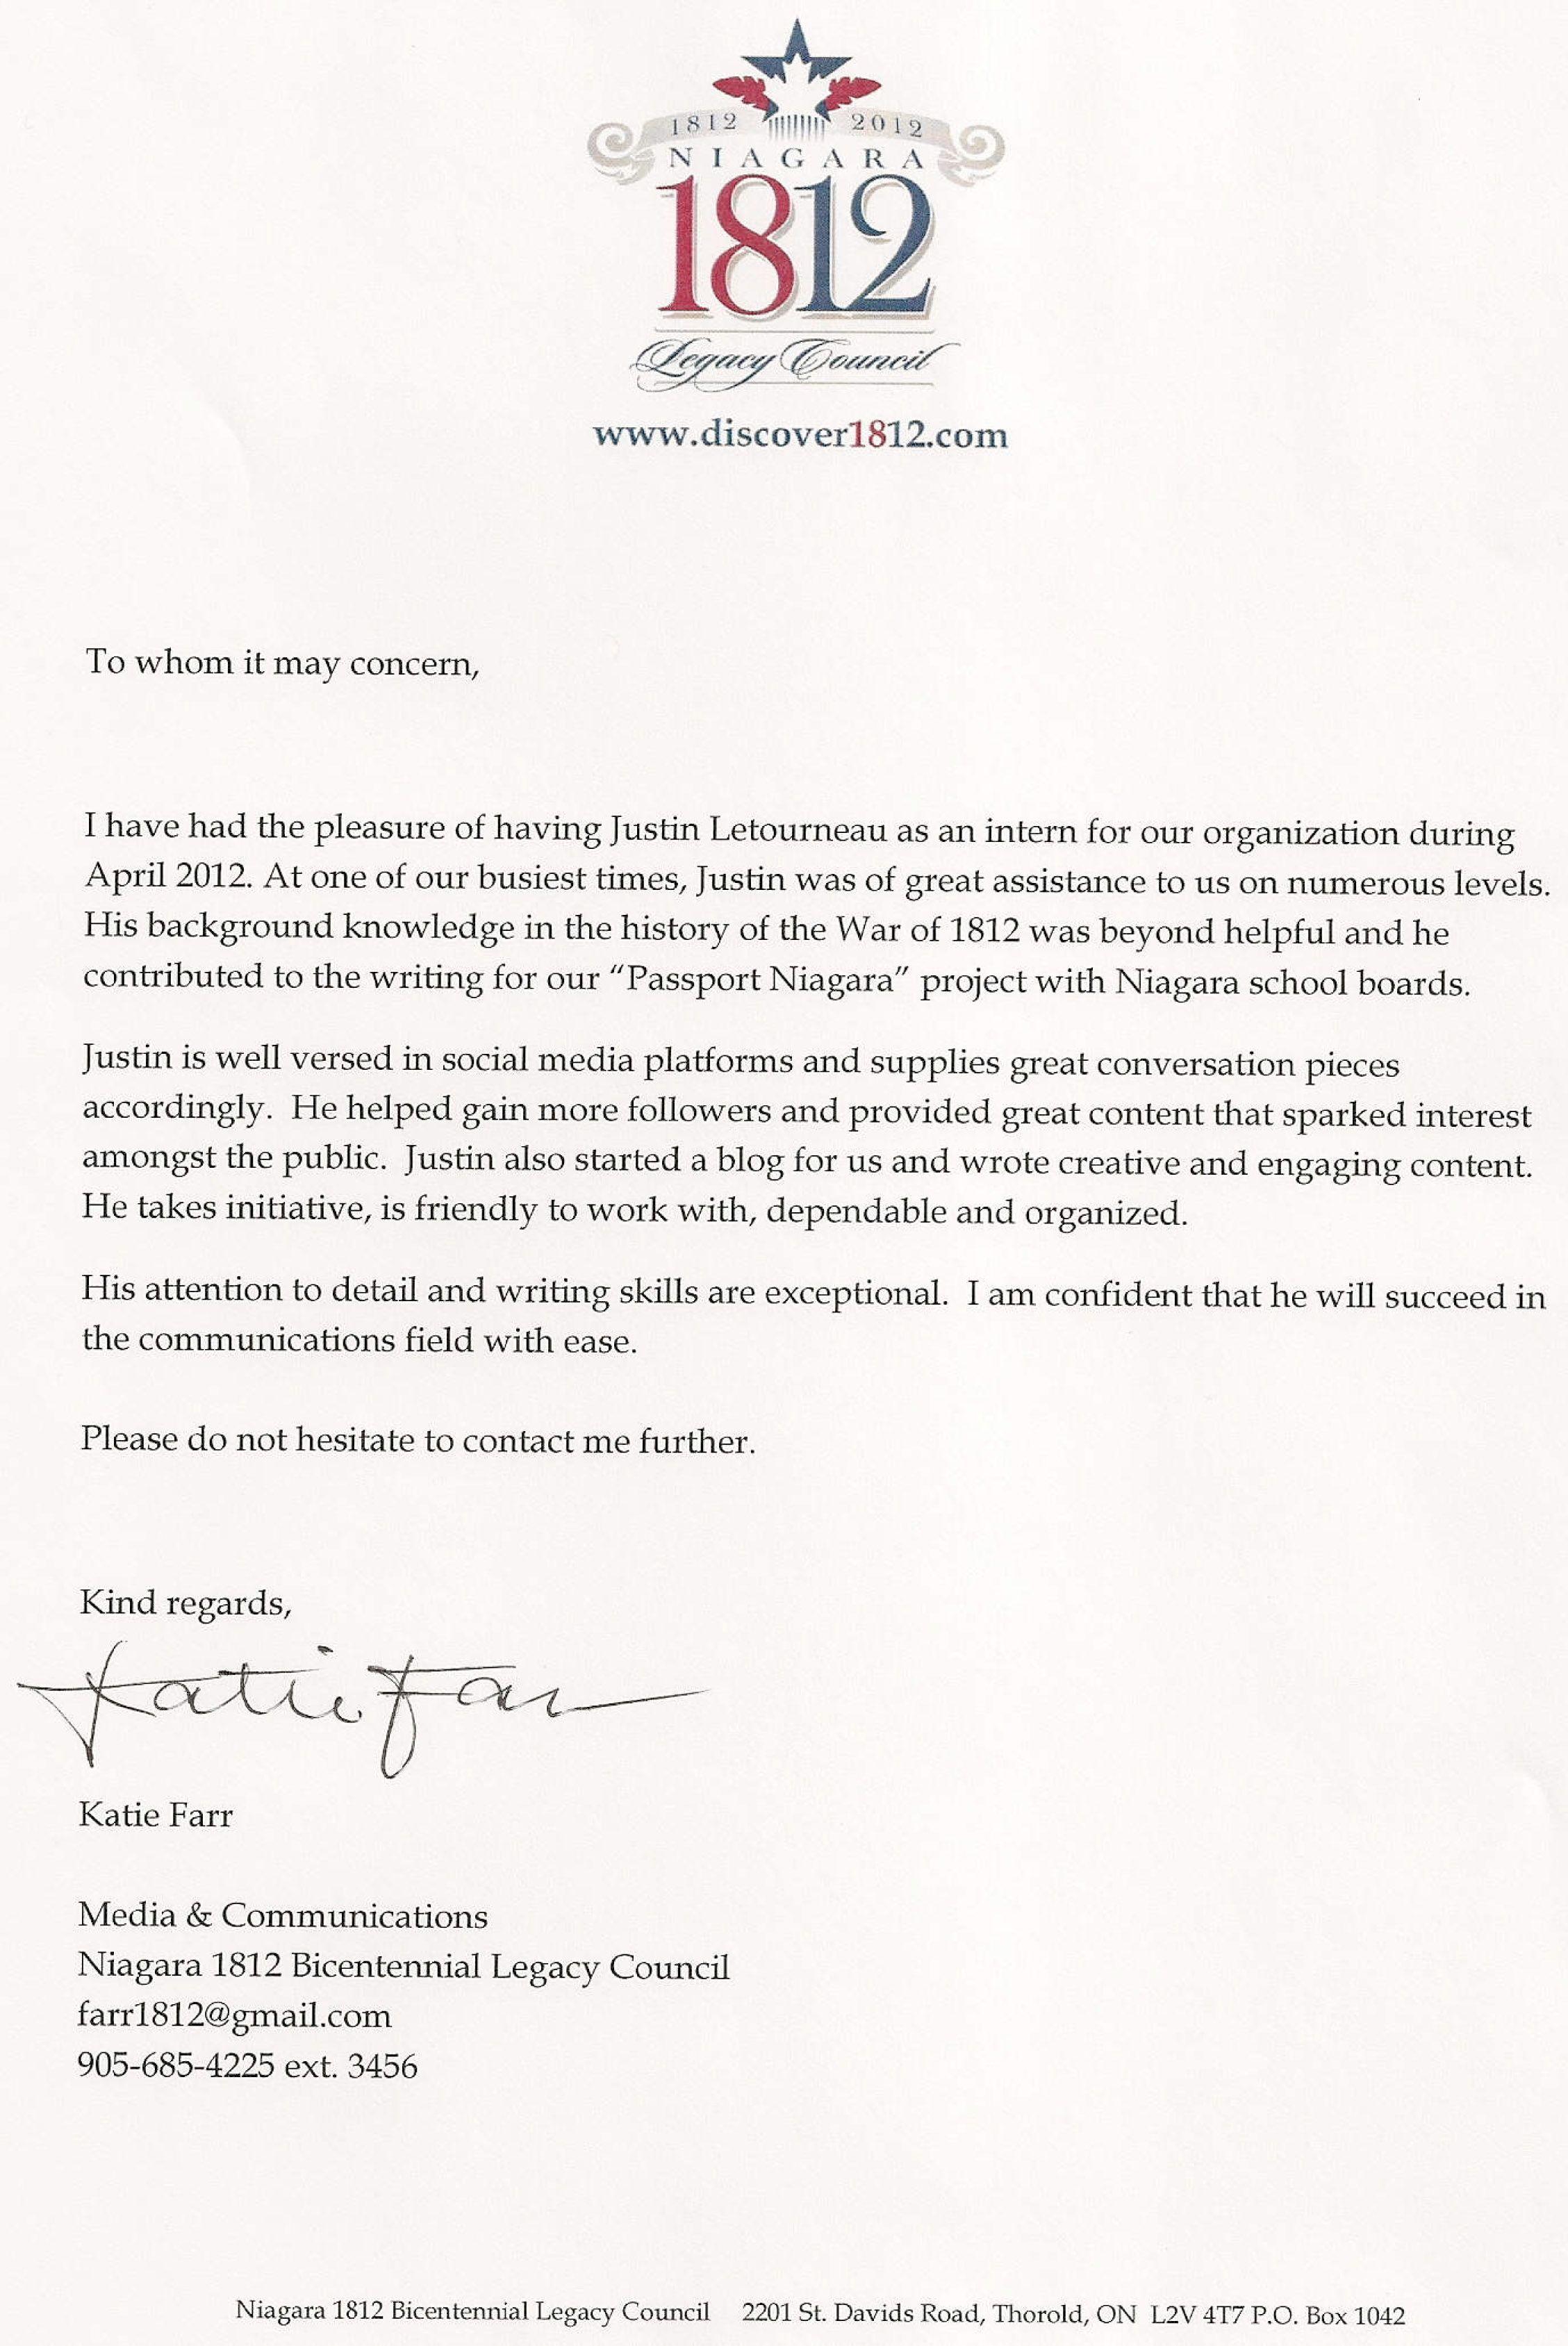 Formal Invitation Letter For Event samples of resume cover letters ...